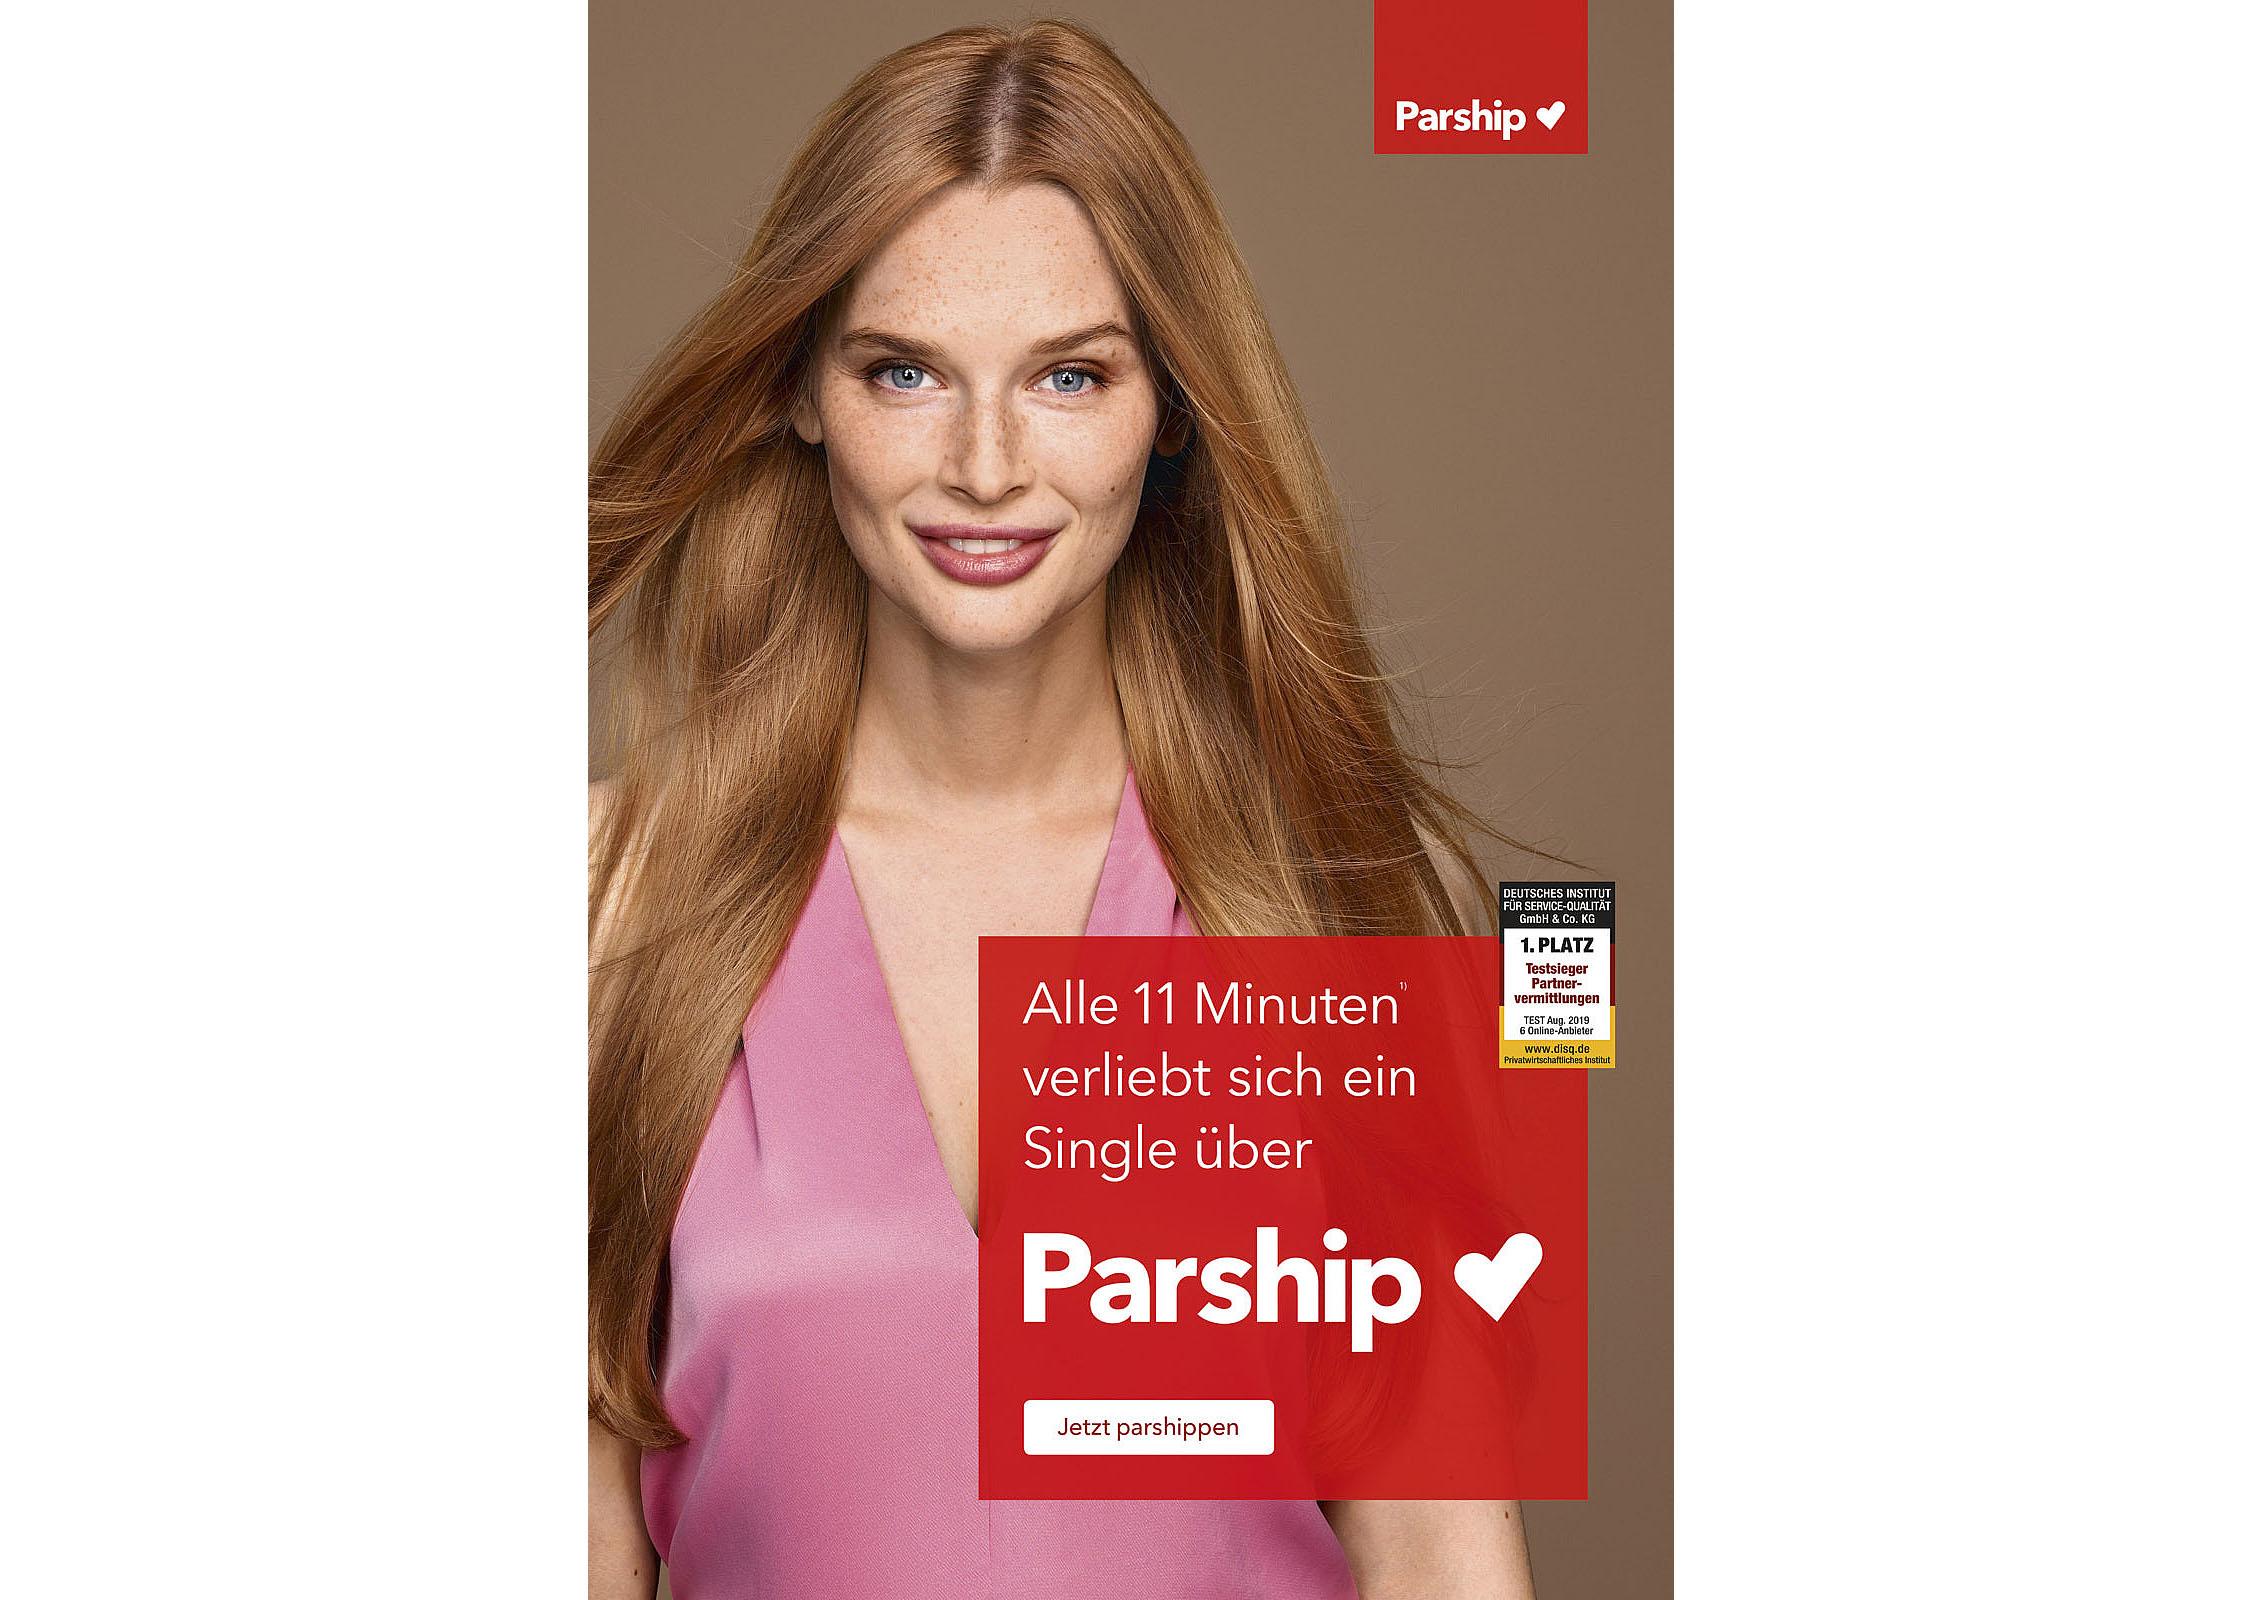 PS_Herbstkampagne2019_Plakate_CLP_Jennifer1_Landscape